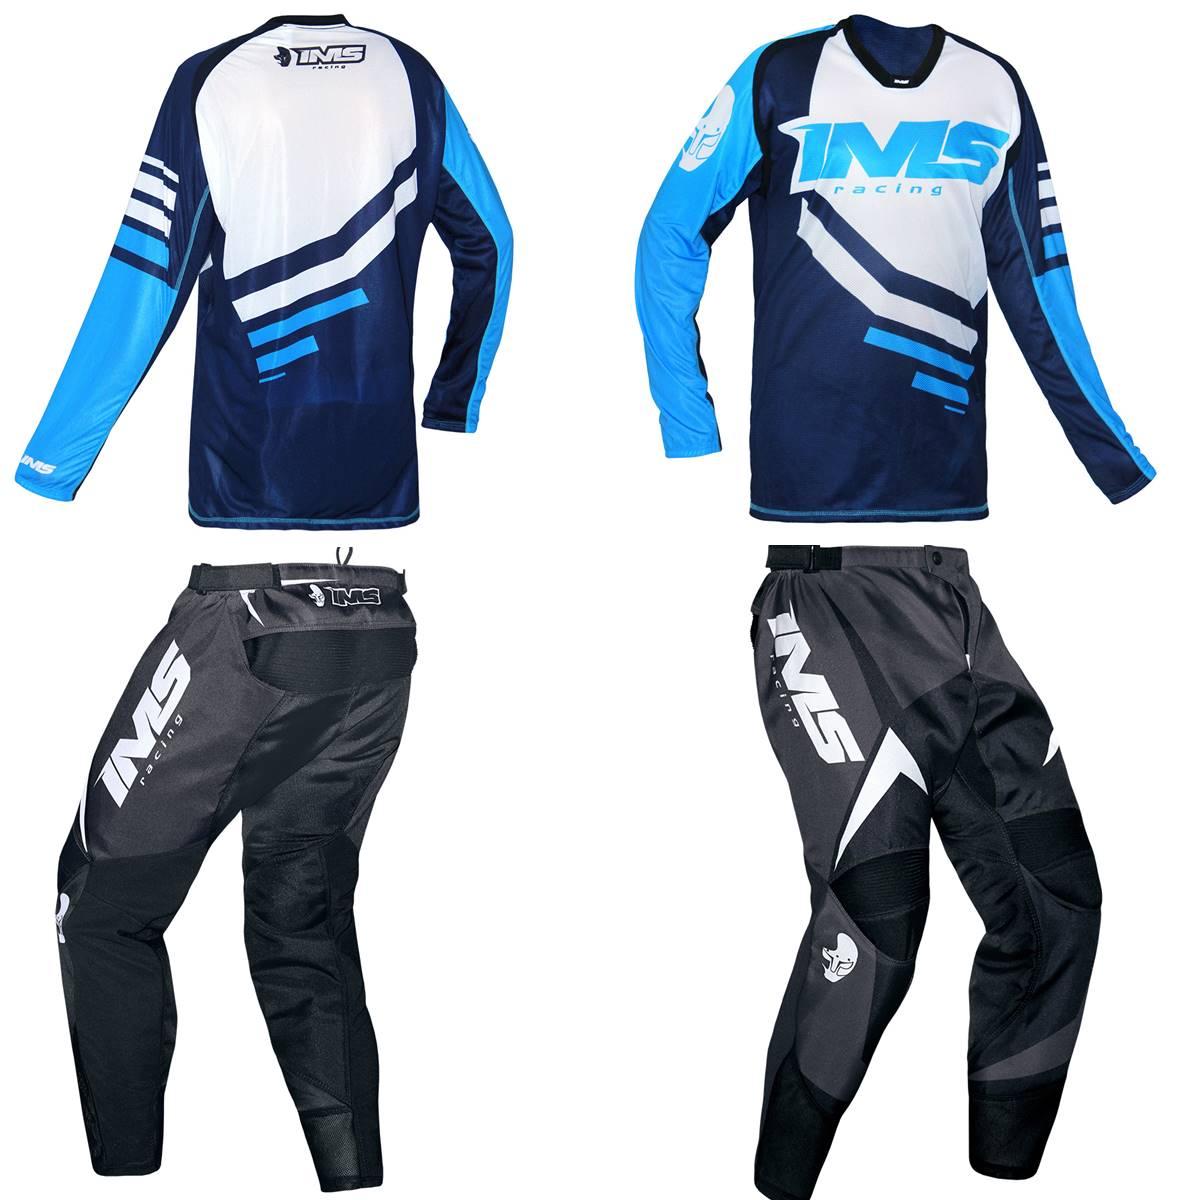 Kit Roupa Ims Camisa Sprint Calça Flex Azul Preto Motocross Trilha